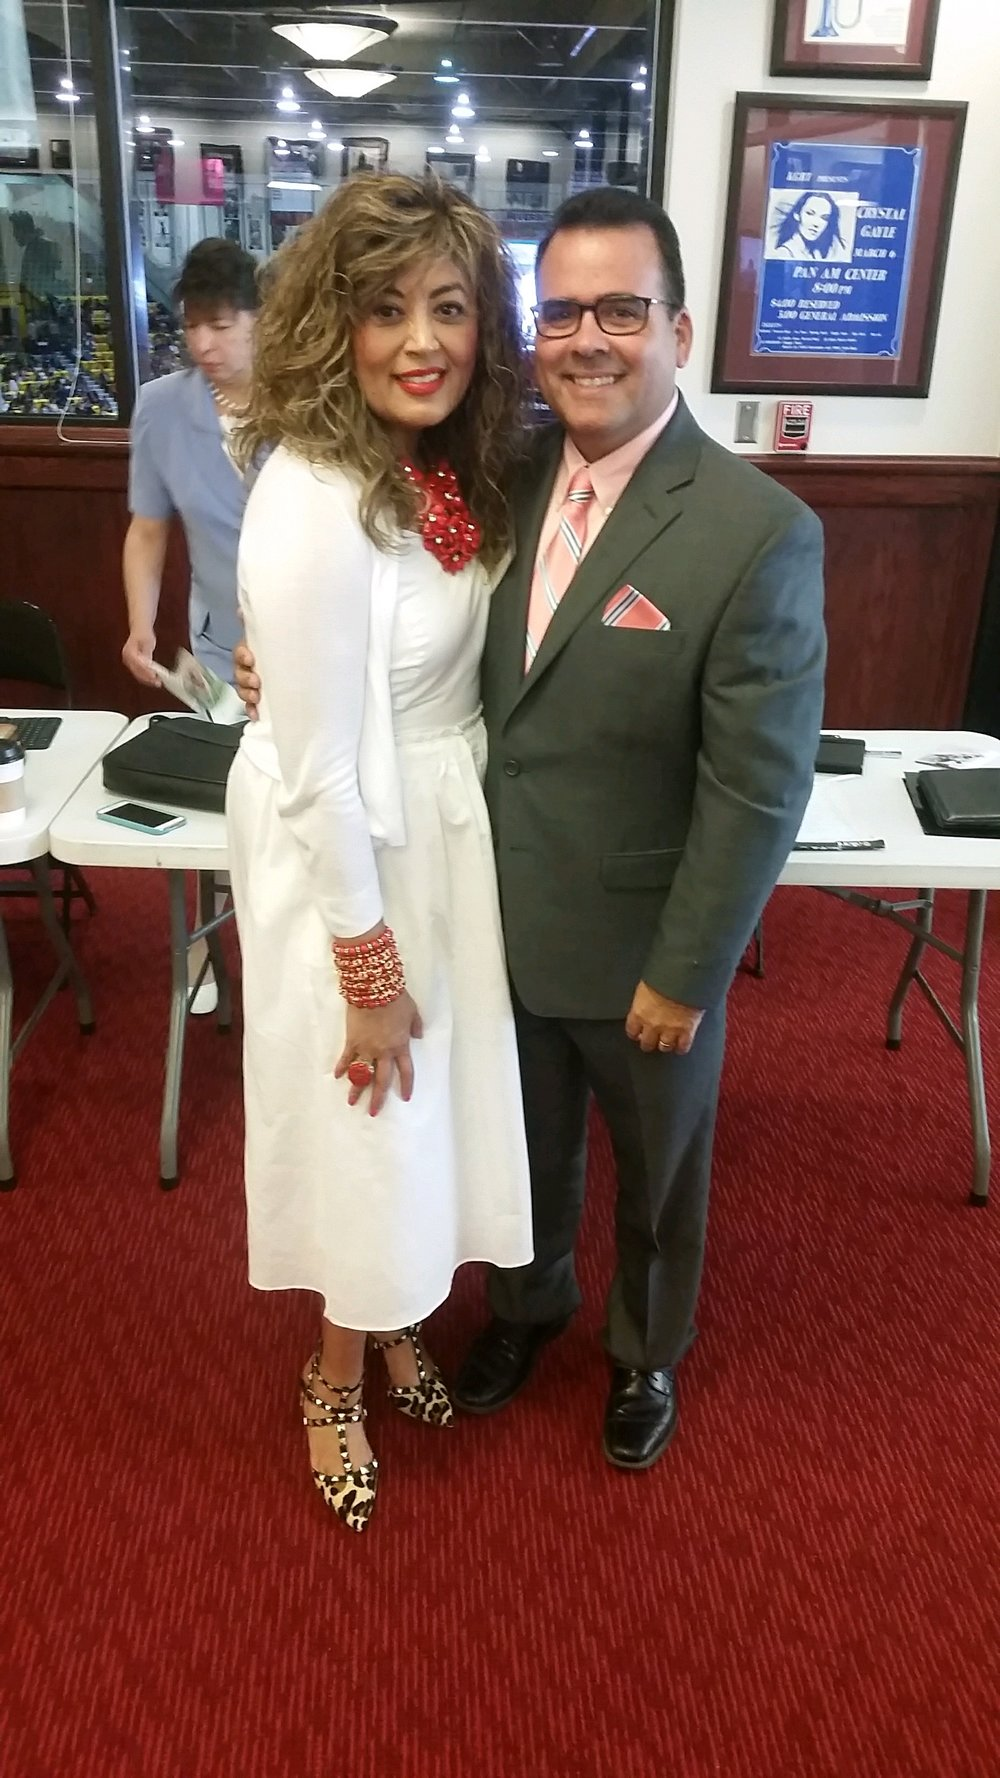 Peter with his beautiful wife dina